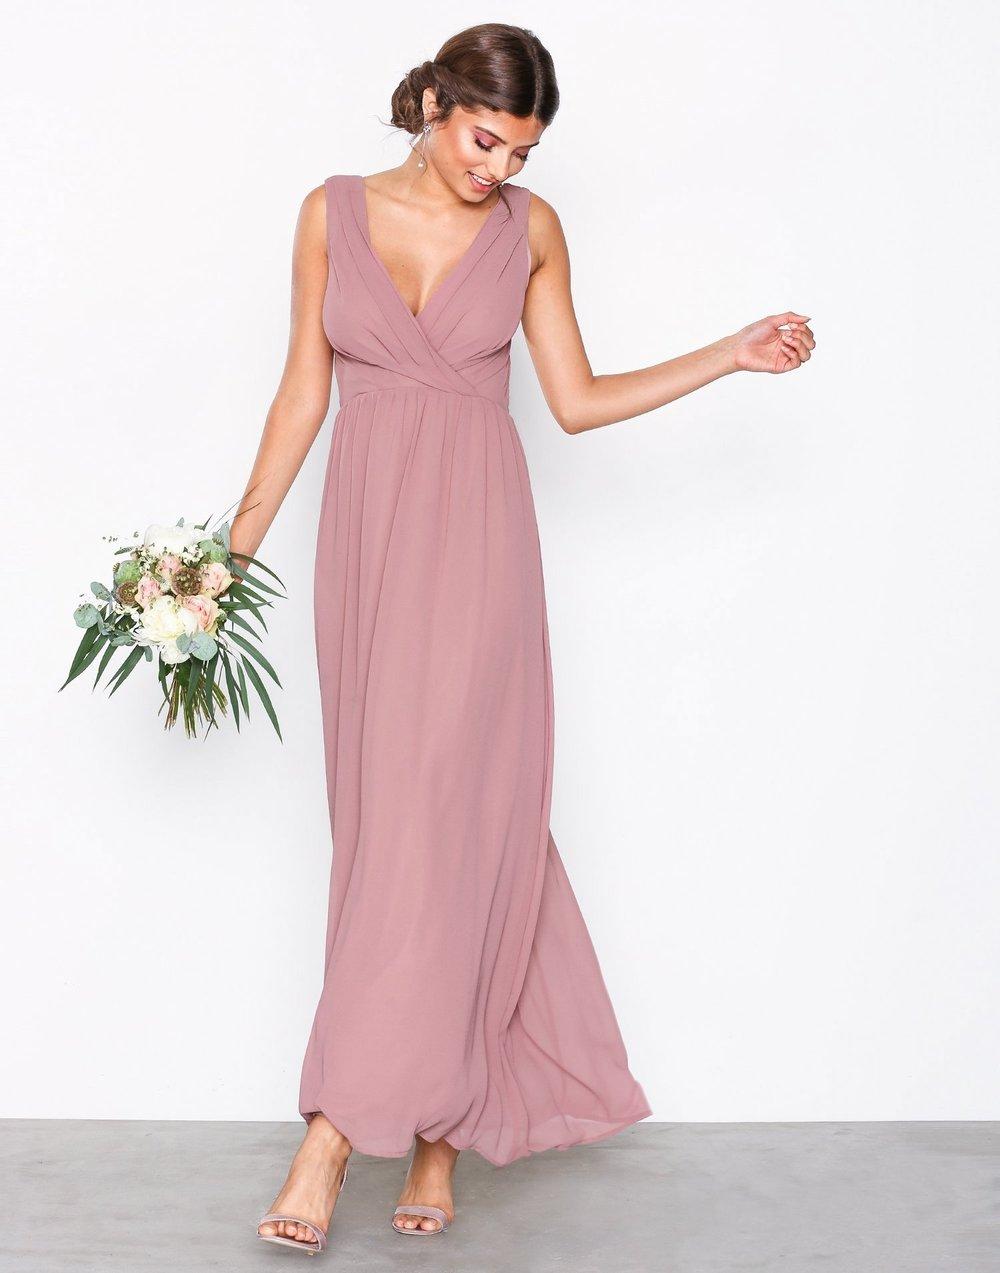 Gammelrosa klänning , Nelly